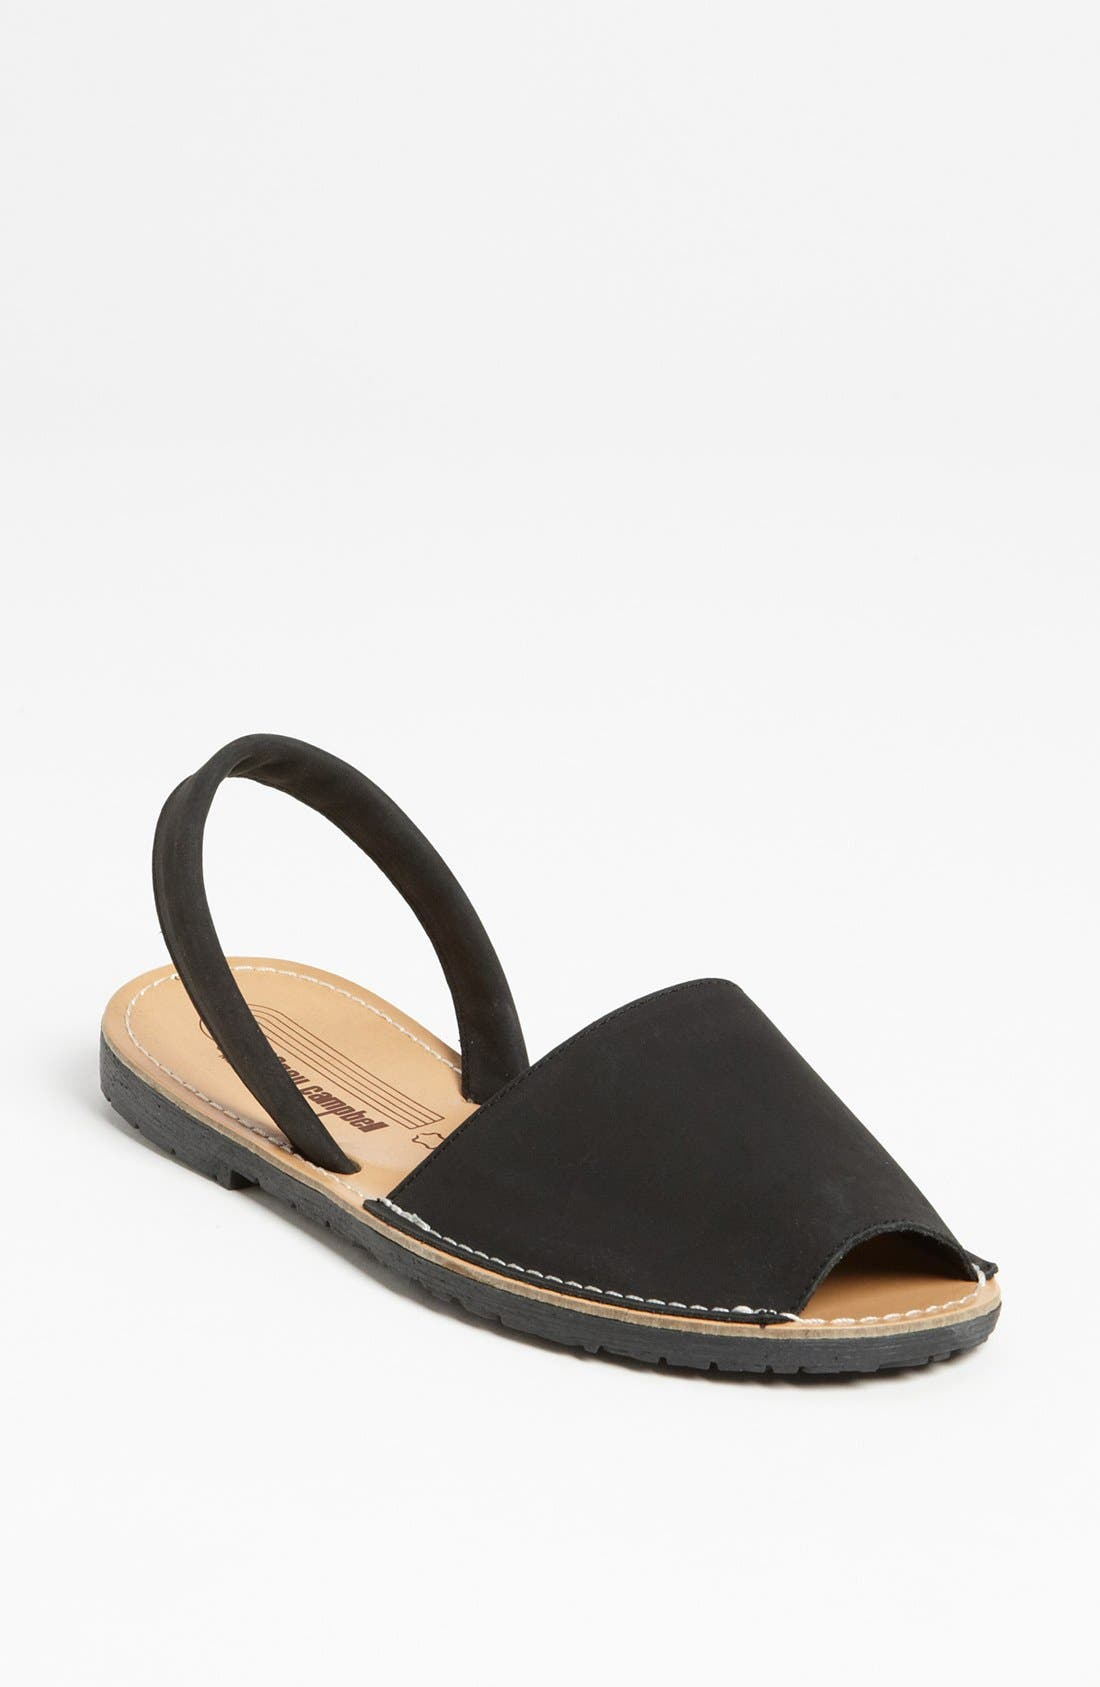 JEFFREY CAMPBELL 'Ibiza' Sandal, Main, color, 003